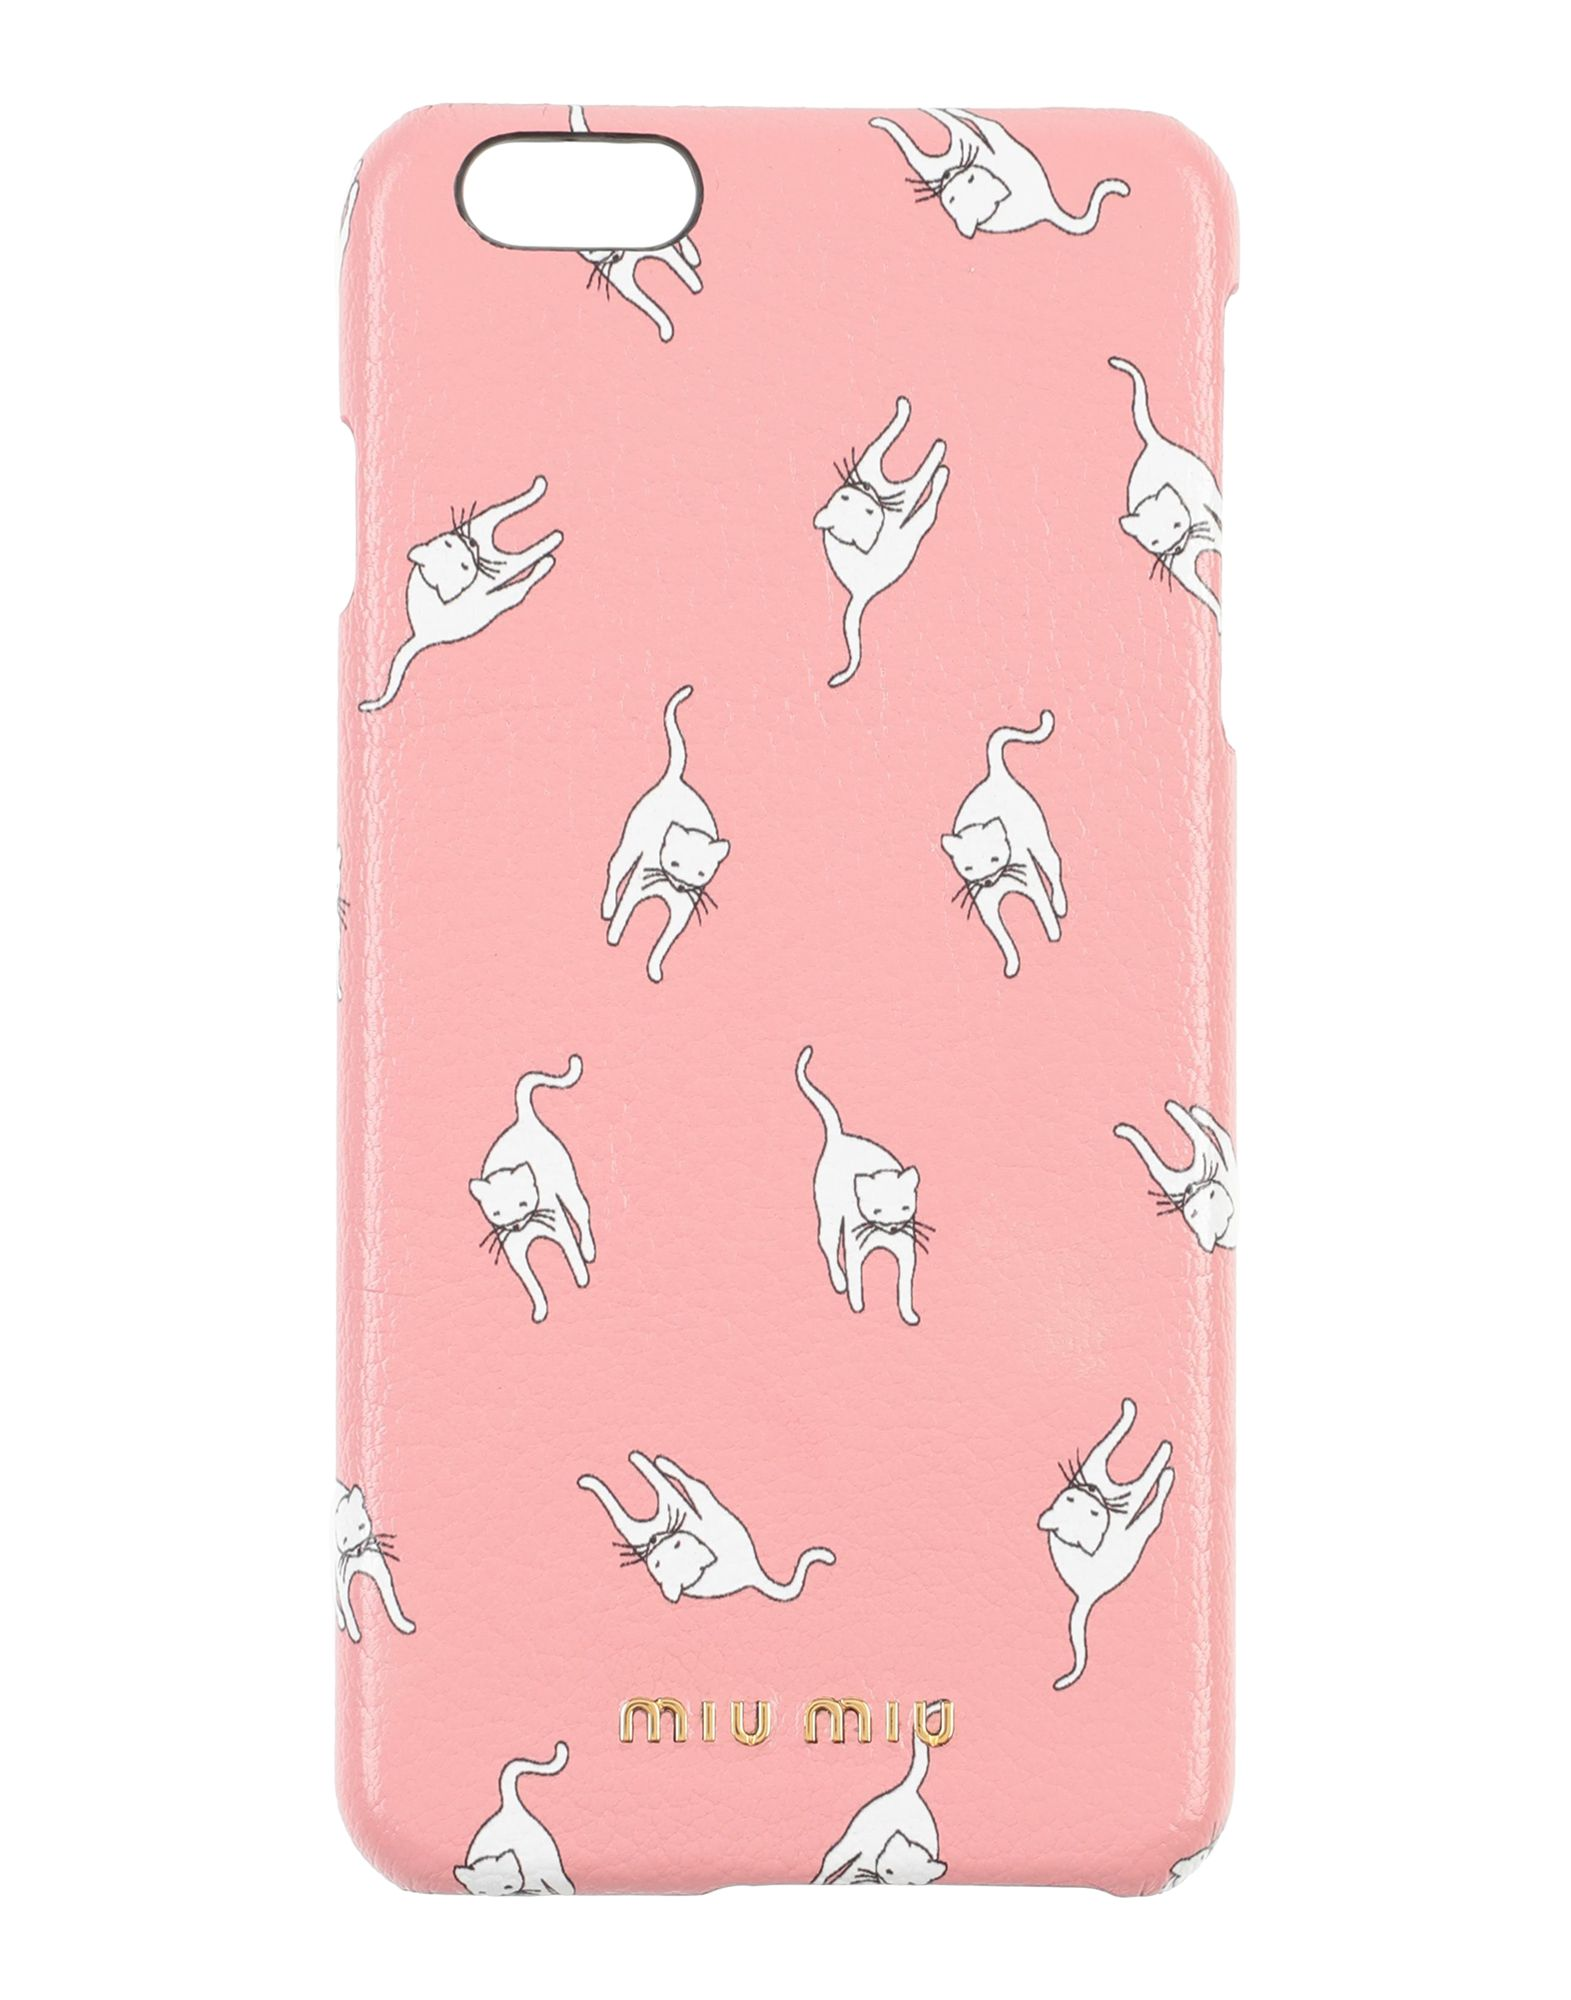 Фото - MIU MIU Чехол чехол накладка для apple iphone 6 6s deppa gel plus case 85213 pink клип кейс полиуретан